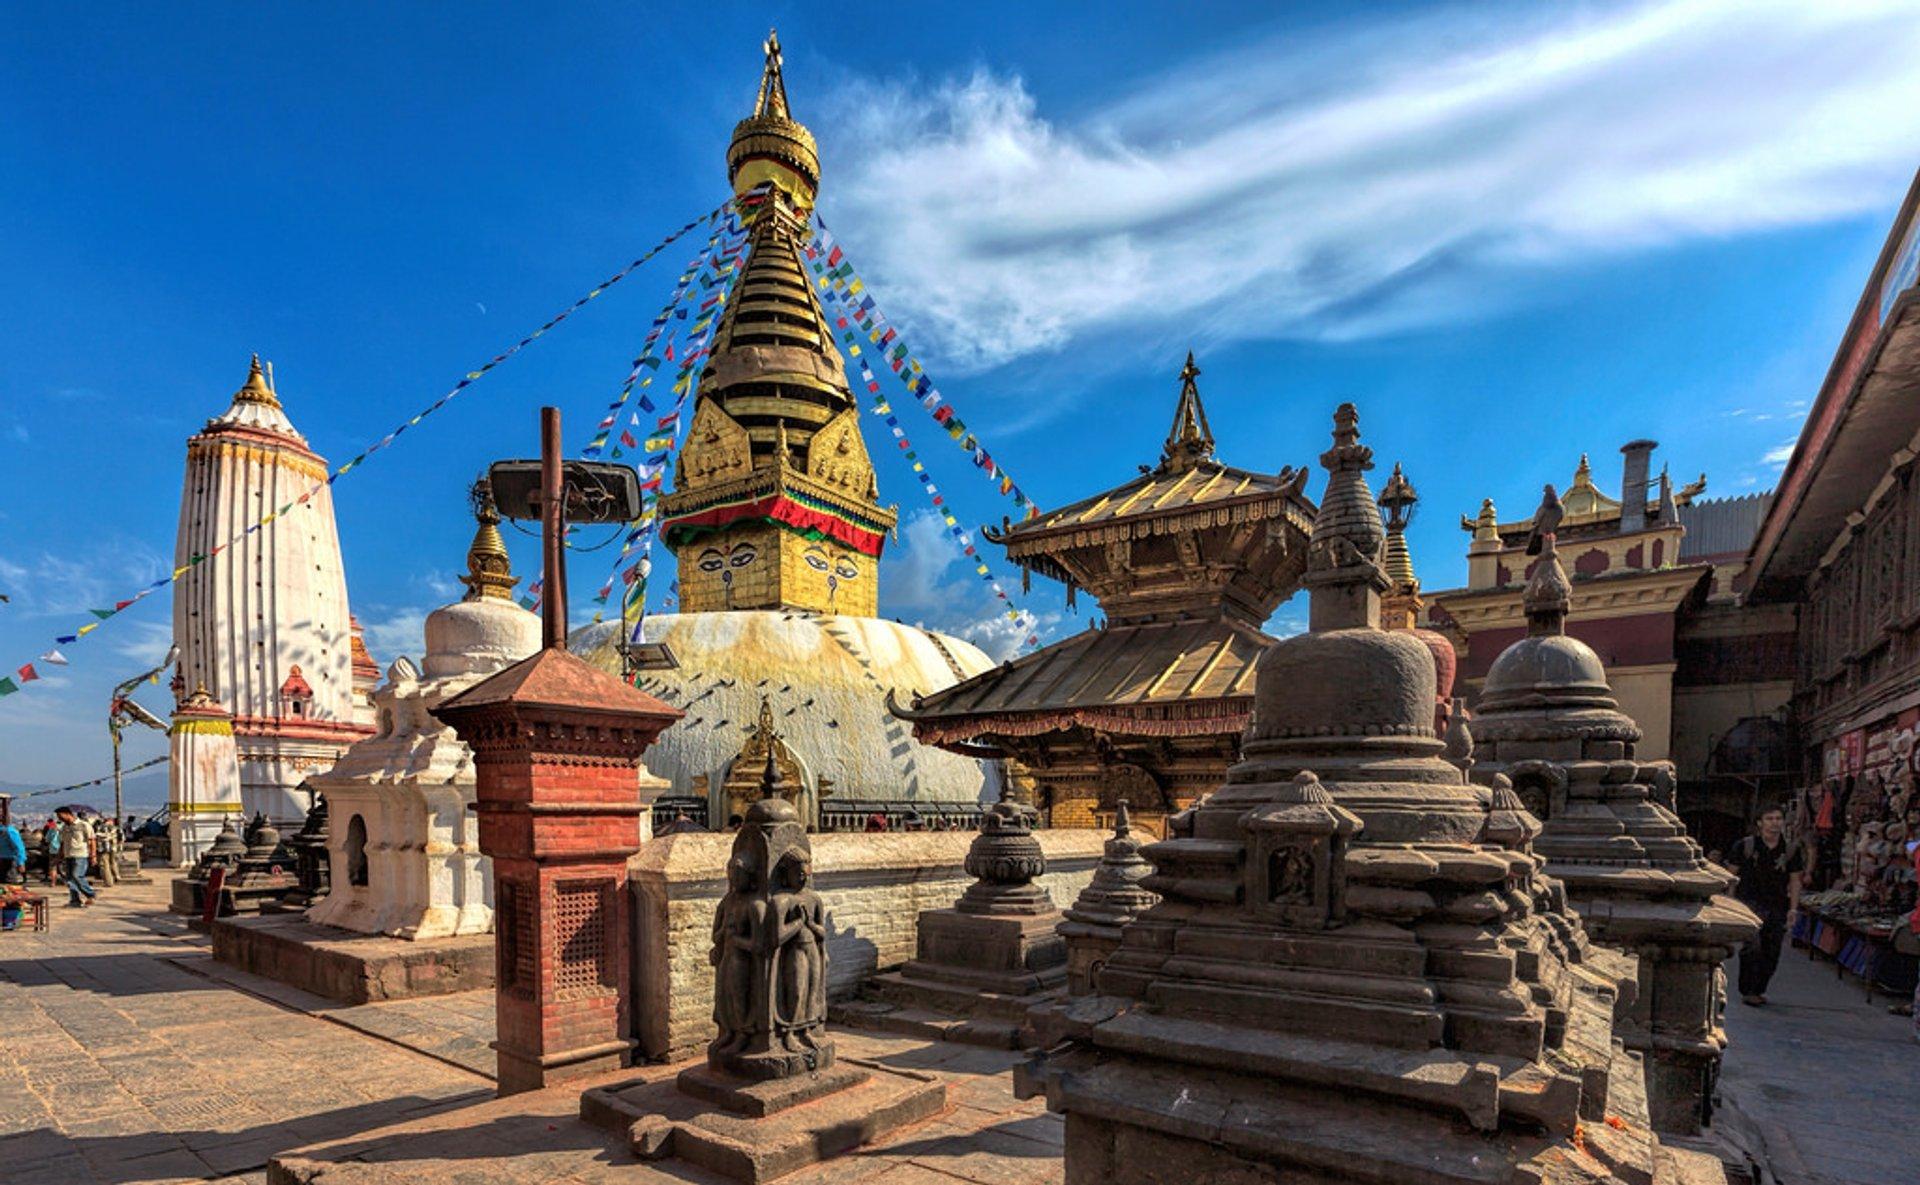 Swayambhunath (Monkey Temple) in Kathmandu - Best Season 2020